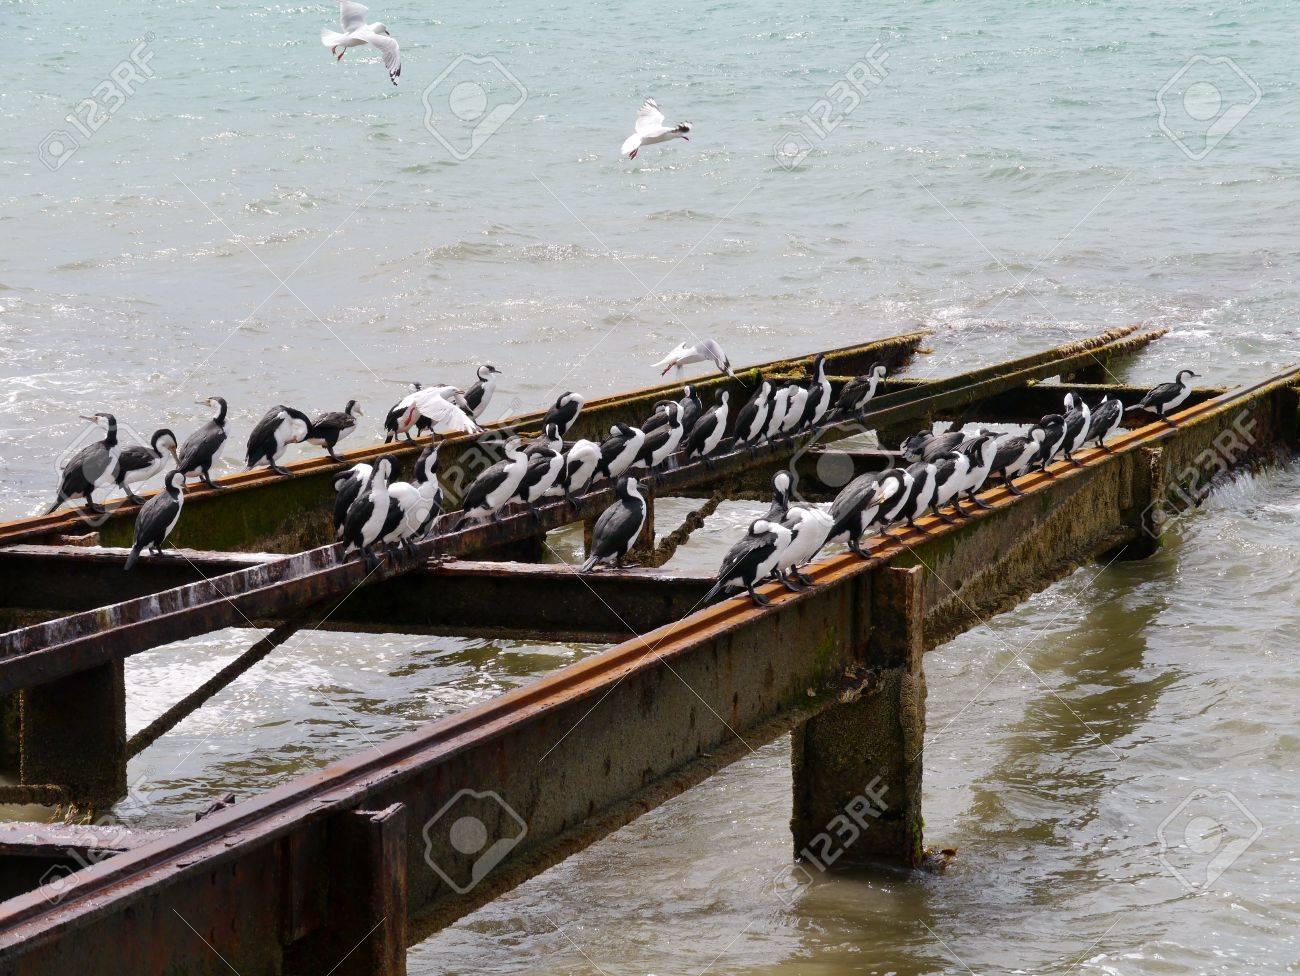 Australian Pied Cormorants  Phalacrocorax varius  also known as the Pied Cormorant or Pied Shag, Stock Photo - 24232335